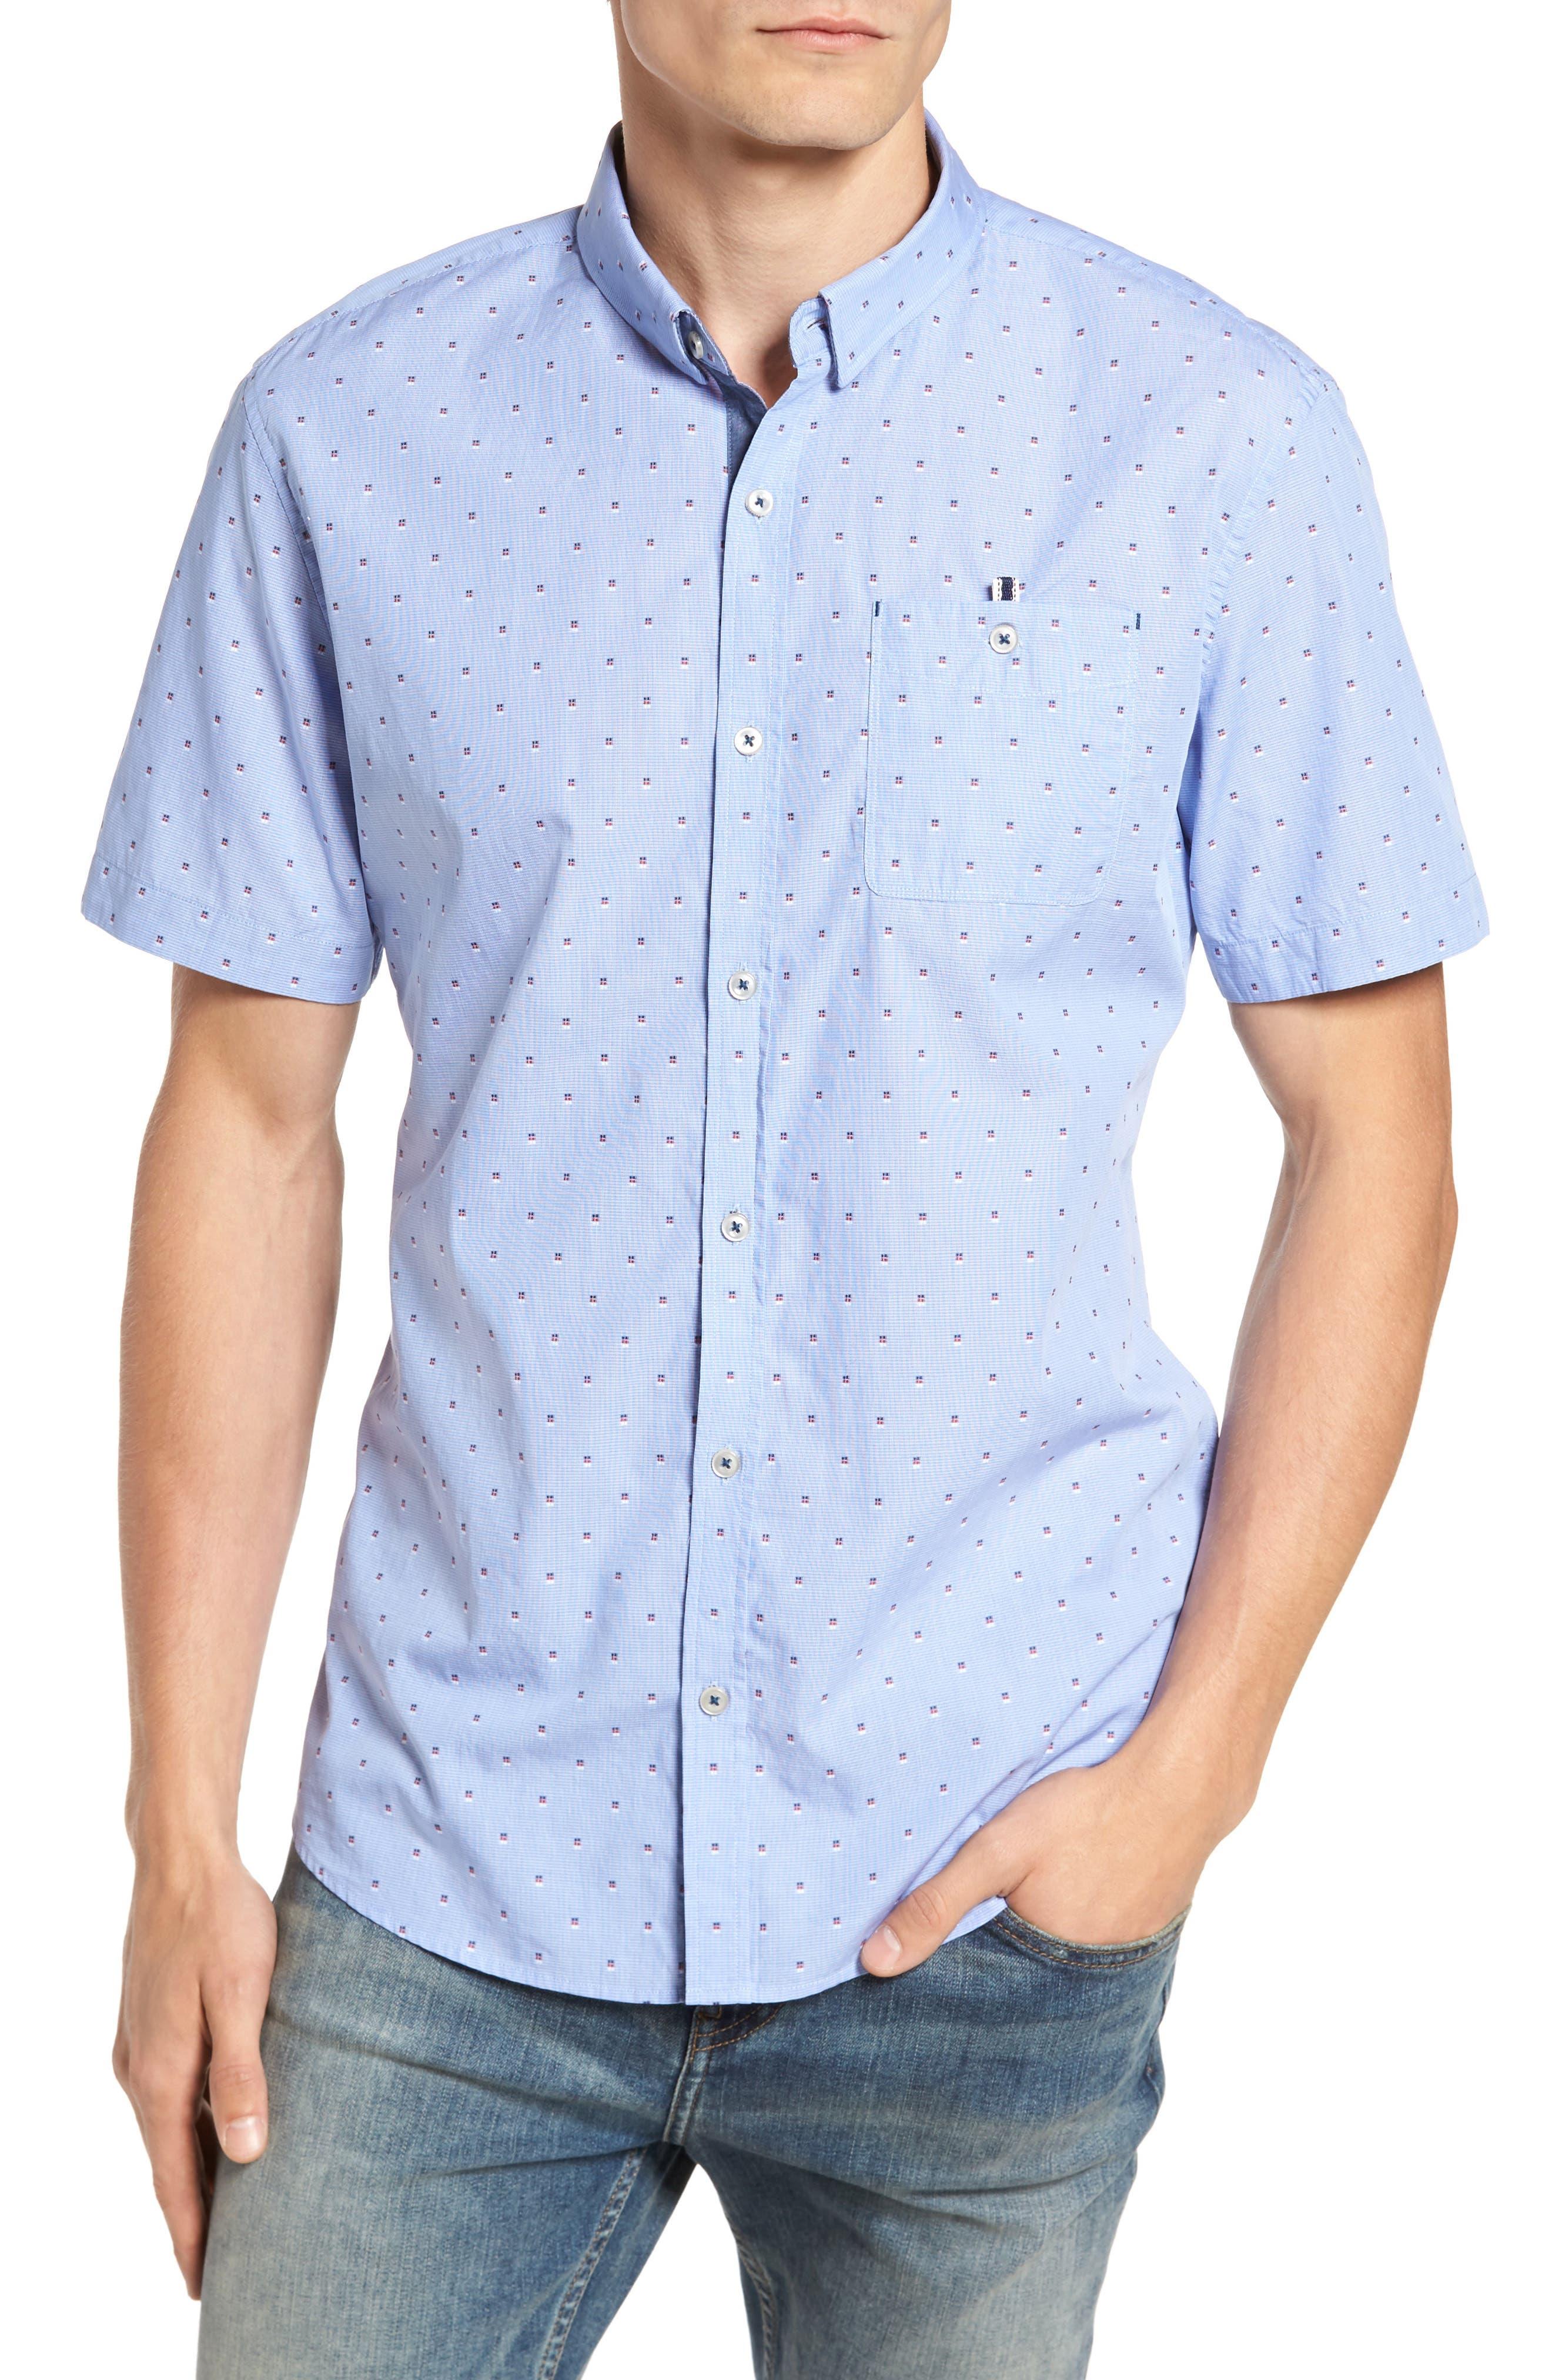 Double Feature Short Sleeve Sport Shirt,                             Main thumbnail 1, color,                             Light Blue